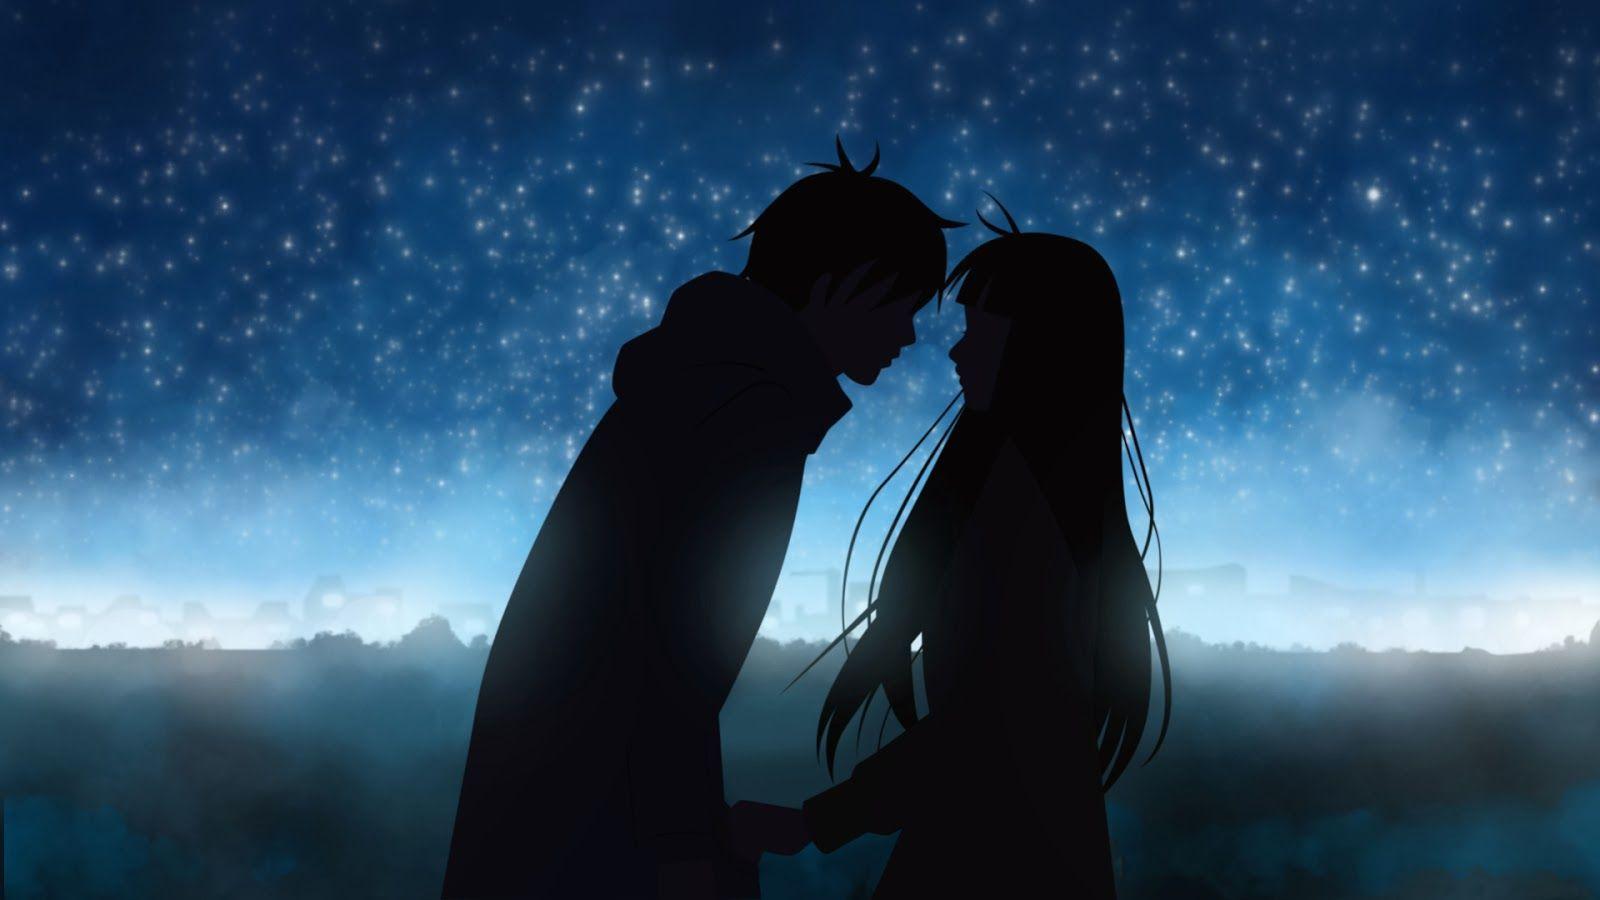 Anime Love Wallpapers Romantic Anime Anime Wallpaper Kimi Ni Todoke